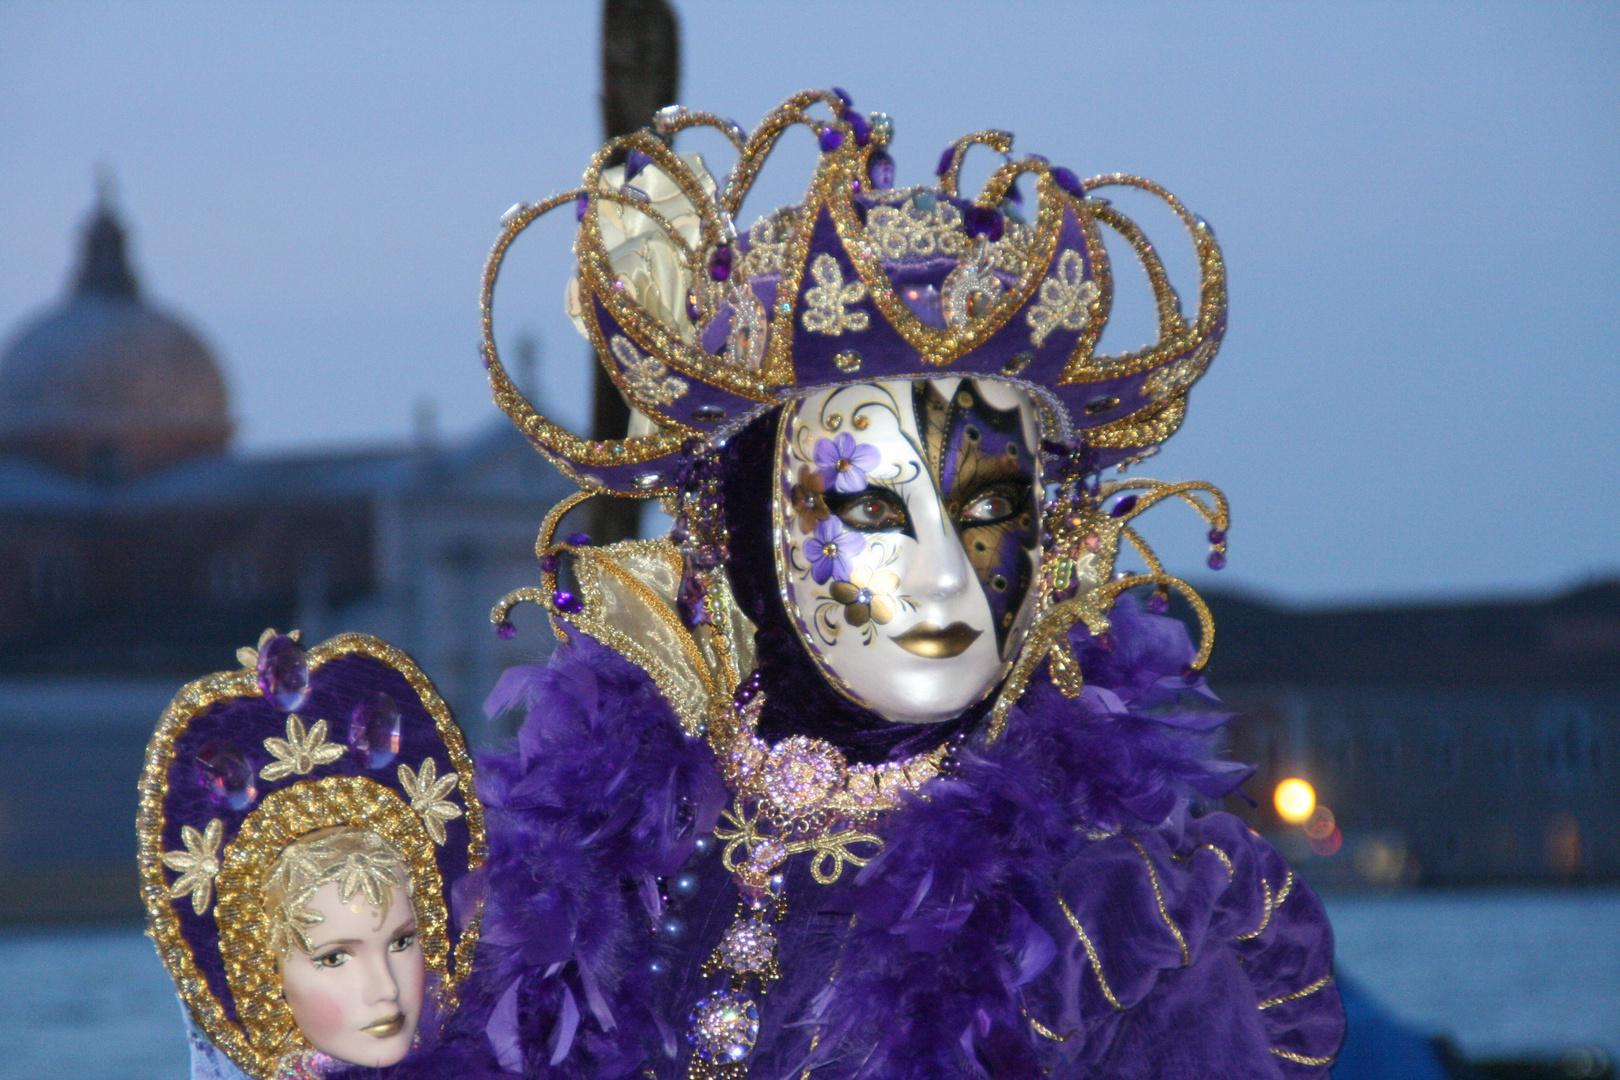 Karneval von Venedig 2010